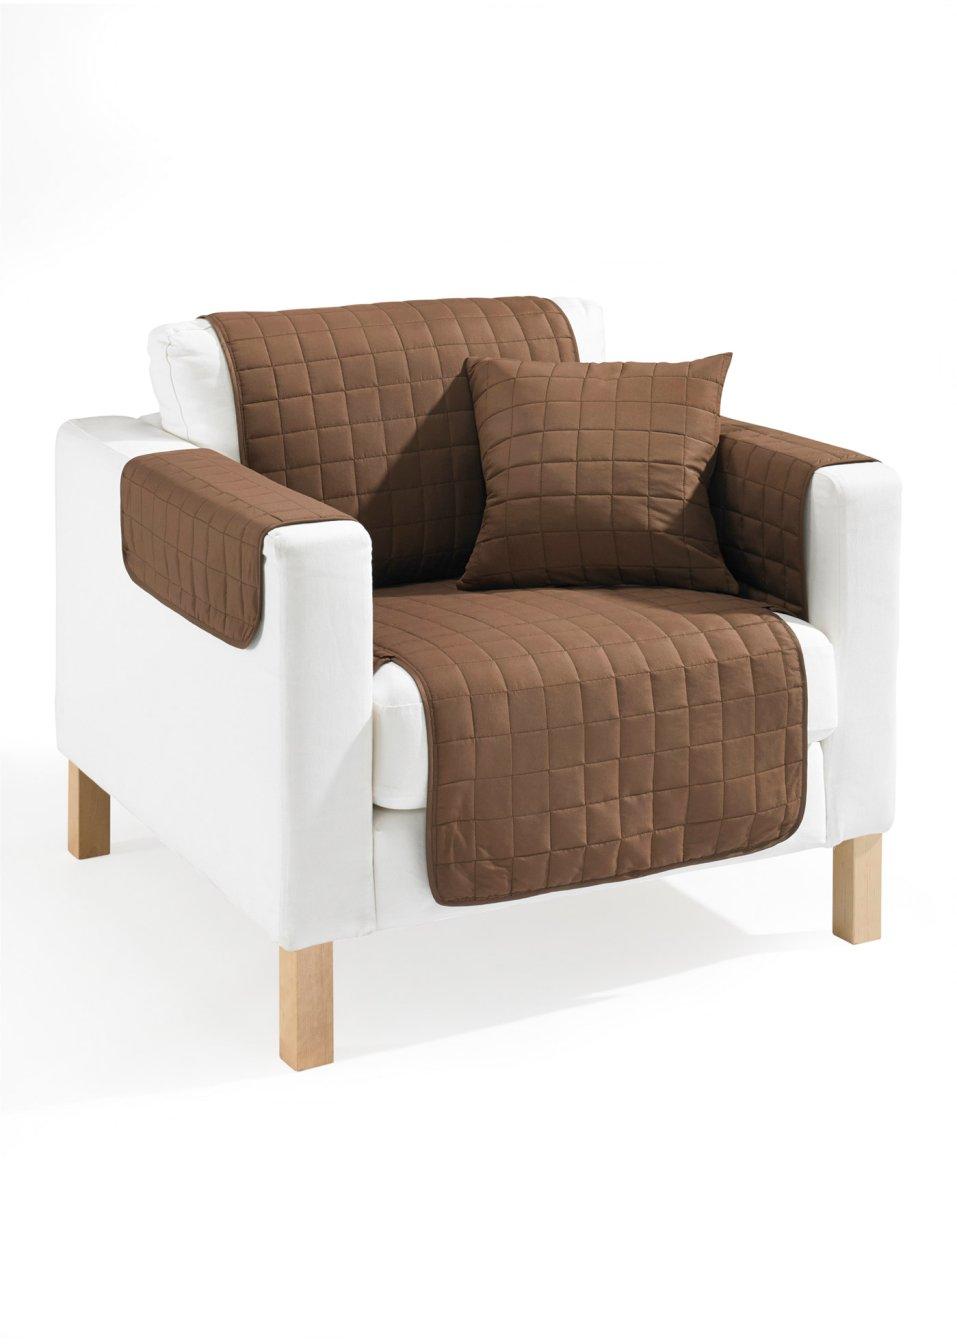 Hussen Stuhlhussen Sofaüberwürfe Online Bonprix